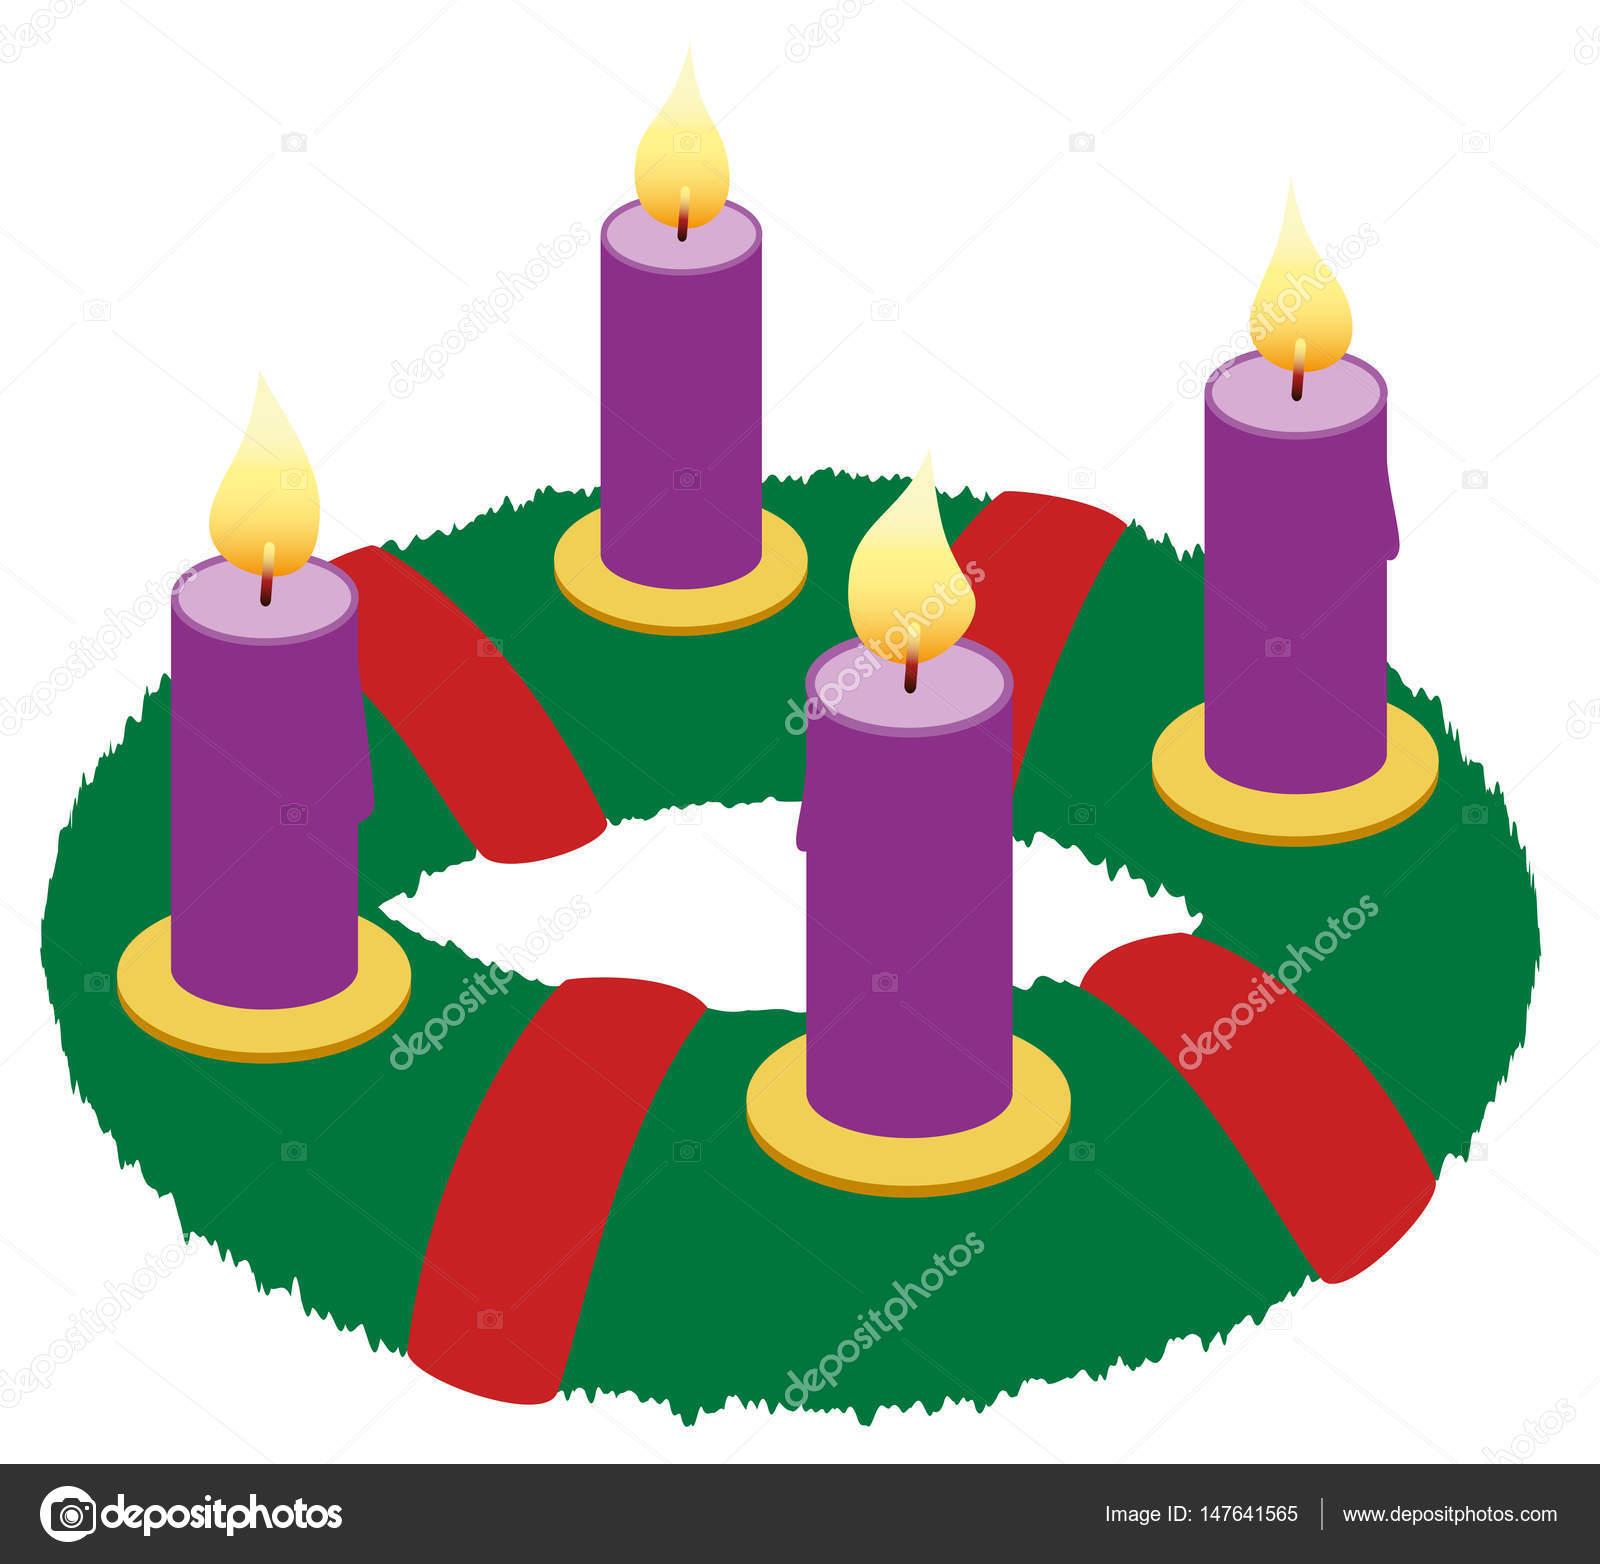 Advent wreath illustration icon symbol stock photo furian advent wreath illustration icon symbol stock photo buycottarizona Image collections